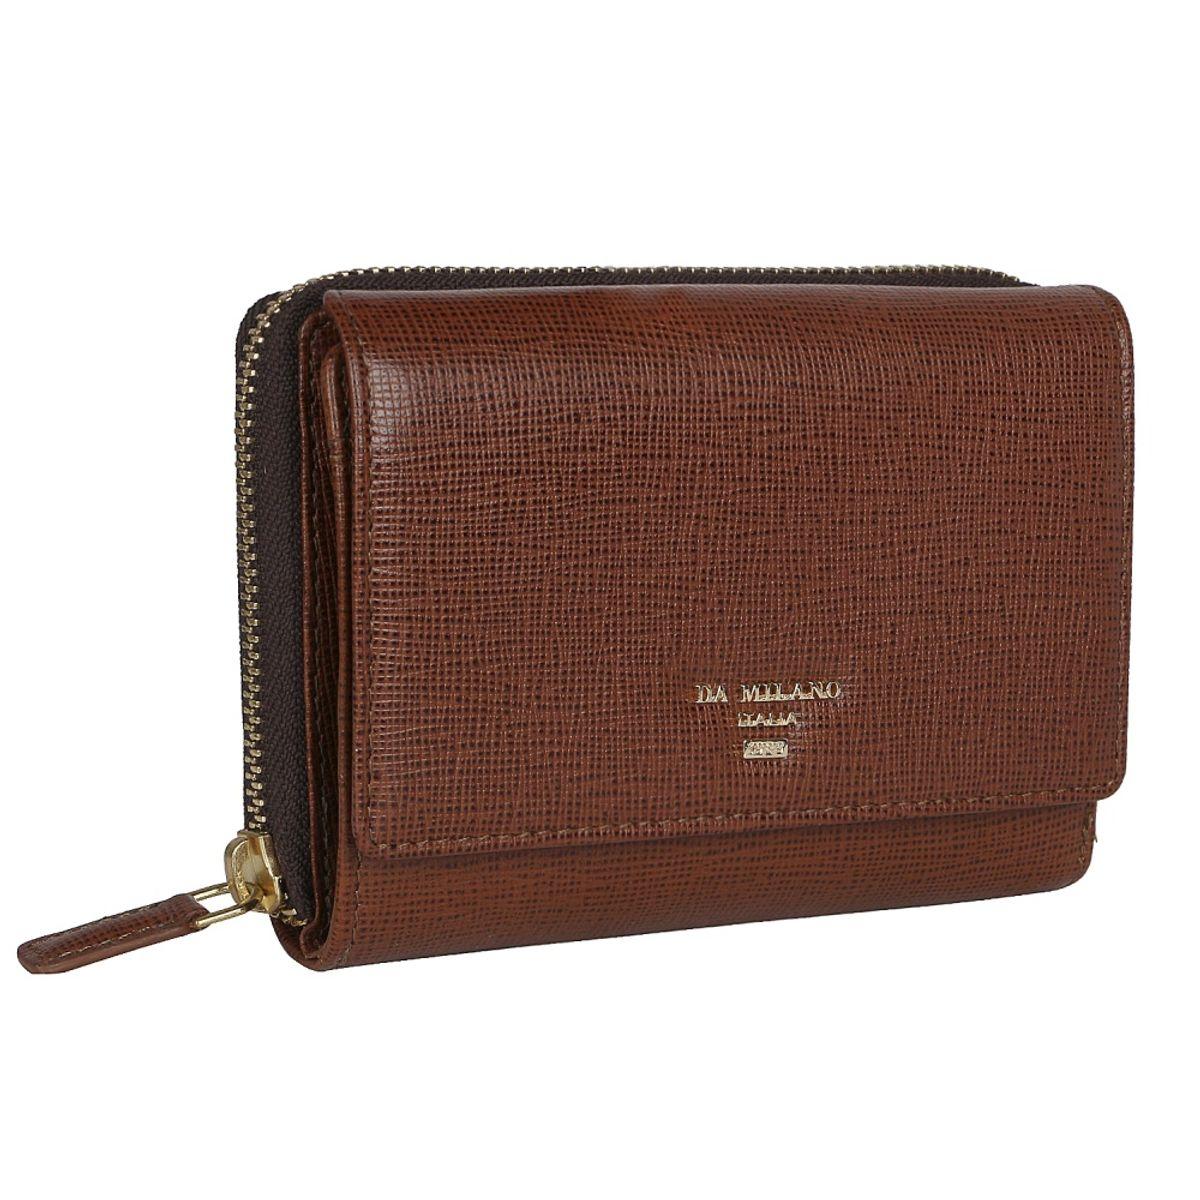 Image result for Wallet For Women! da milano